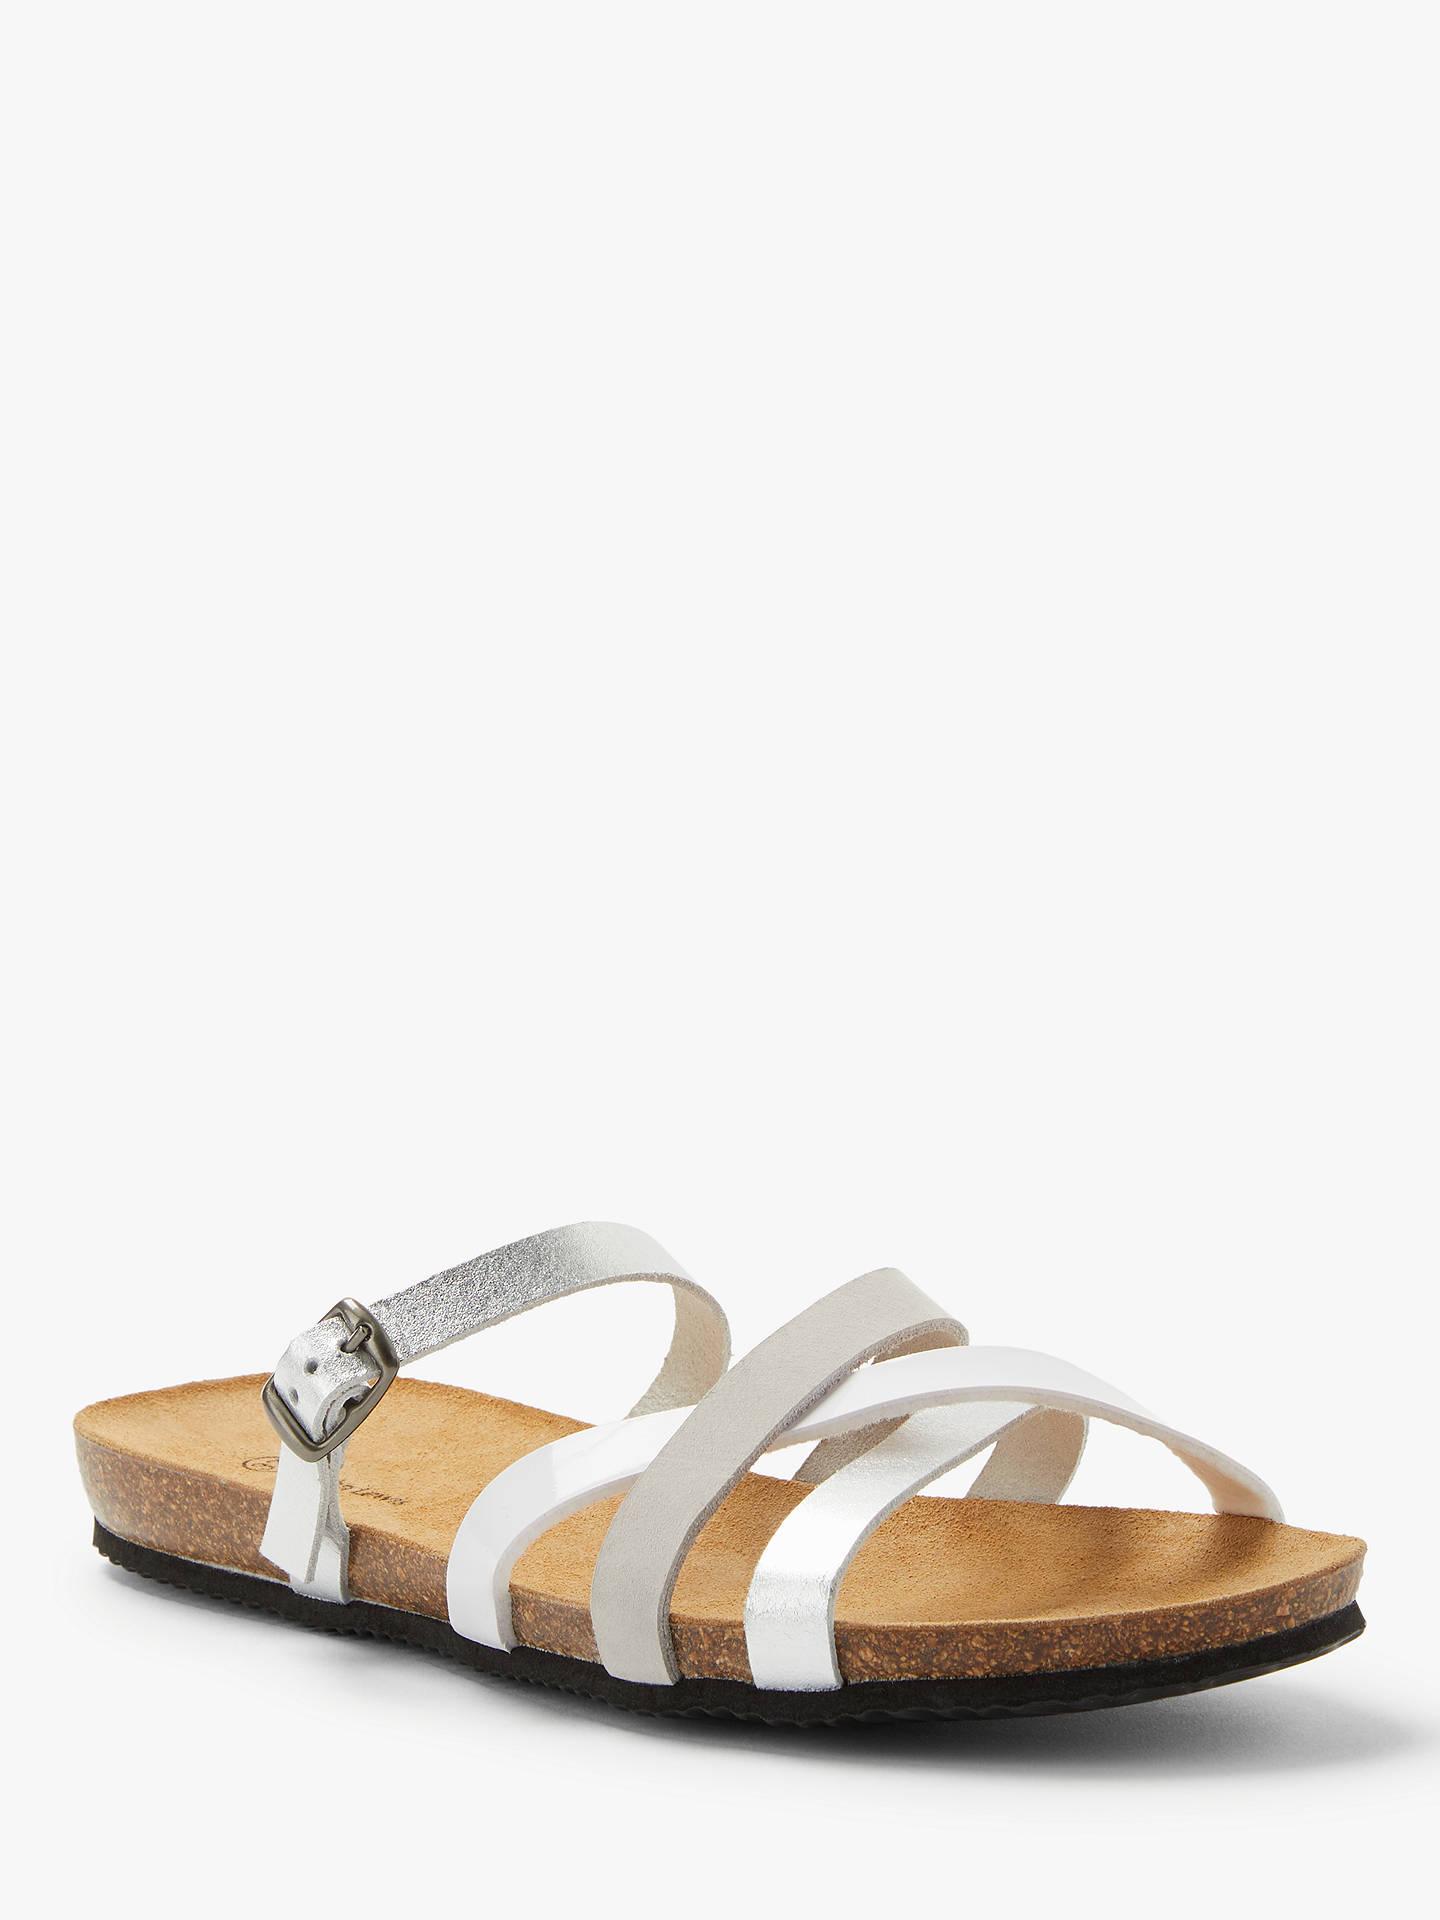 2b5c38d13064 John Lewis   Partners Lois Open Toe Flat Sandals at John Lewis ...